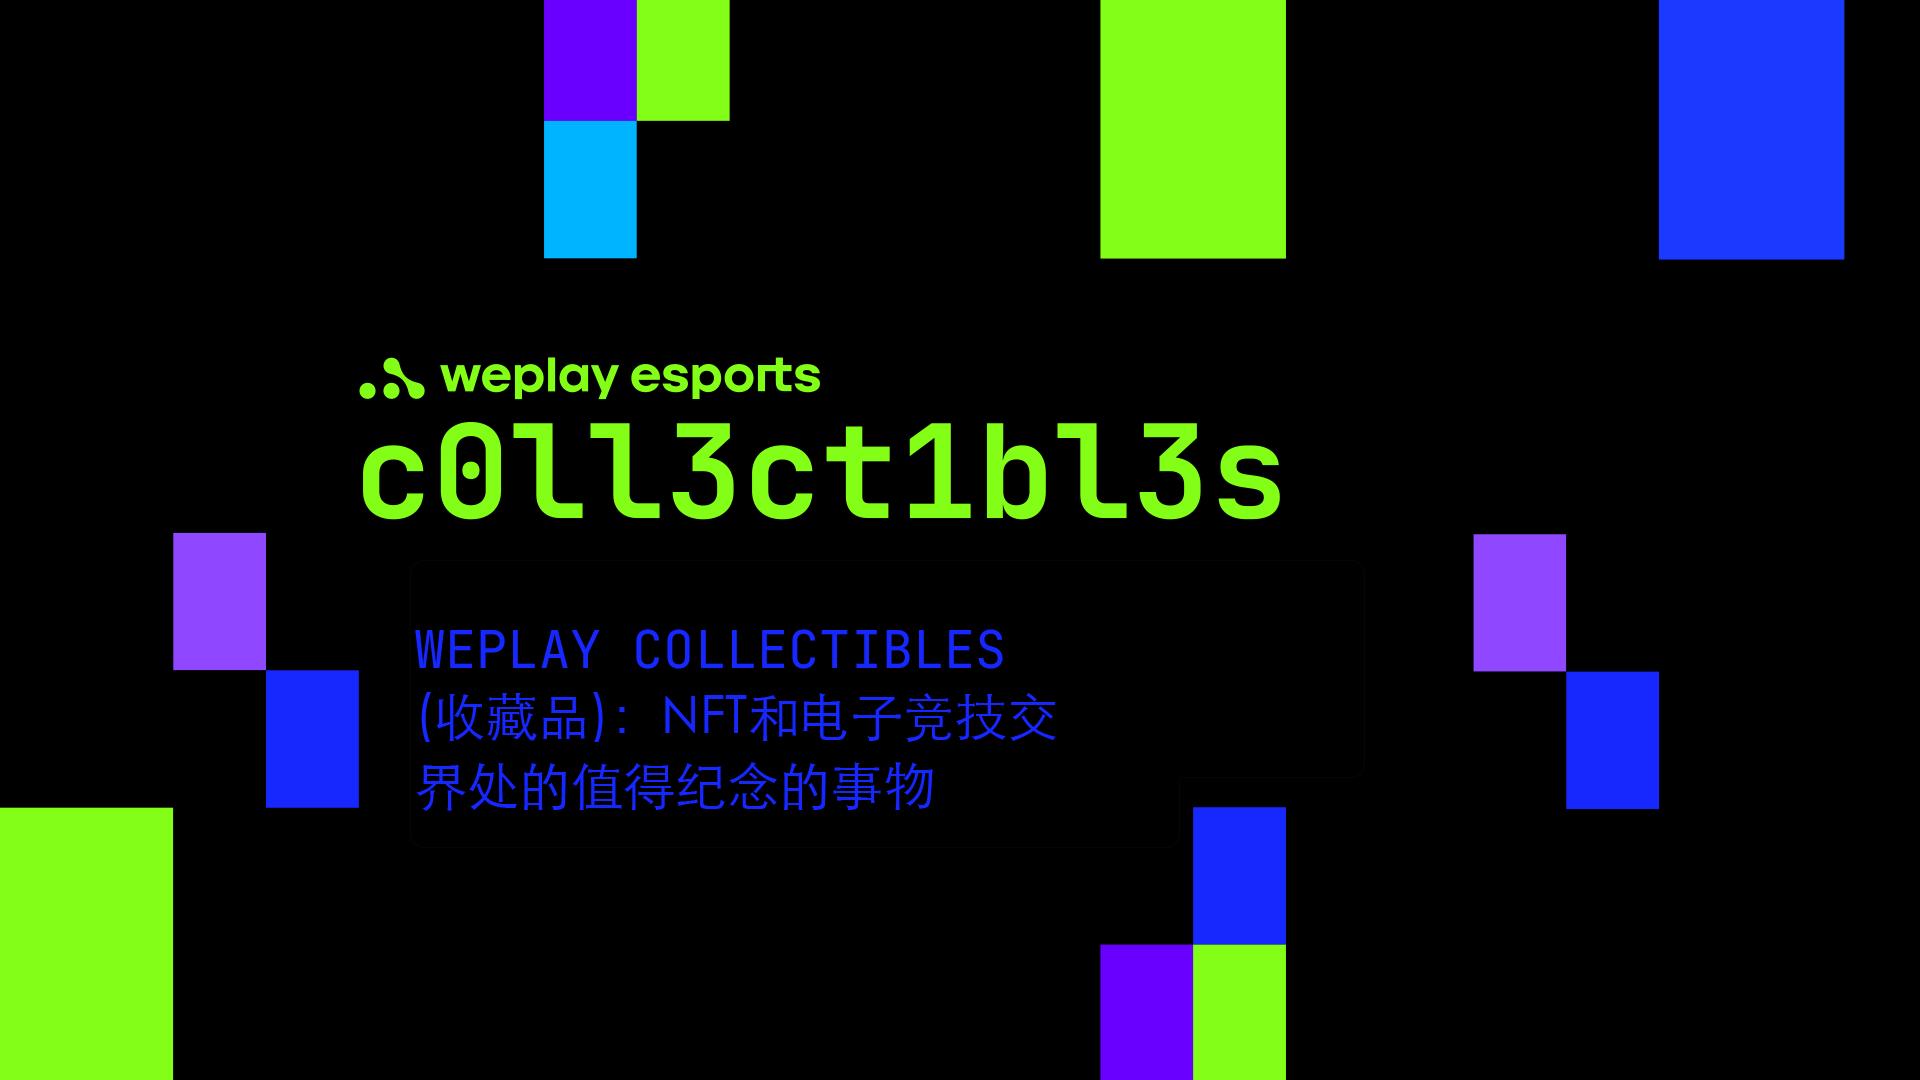 WePlay Collectibles (收藏品):NFT和电子竞技交界处的值得纪念的事物